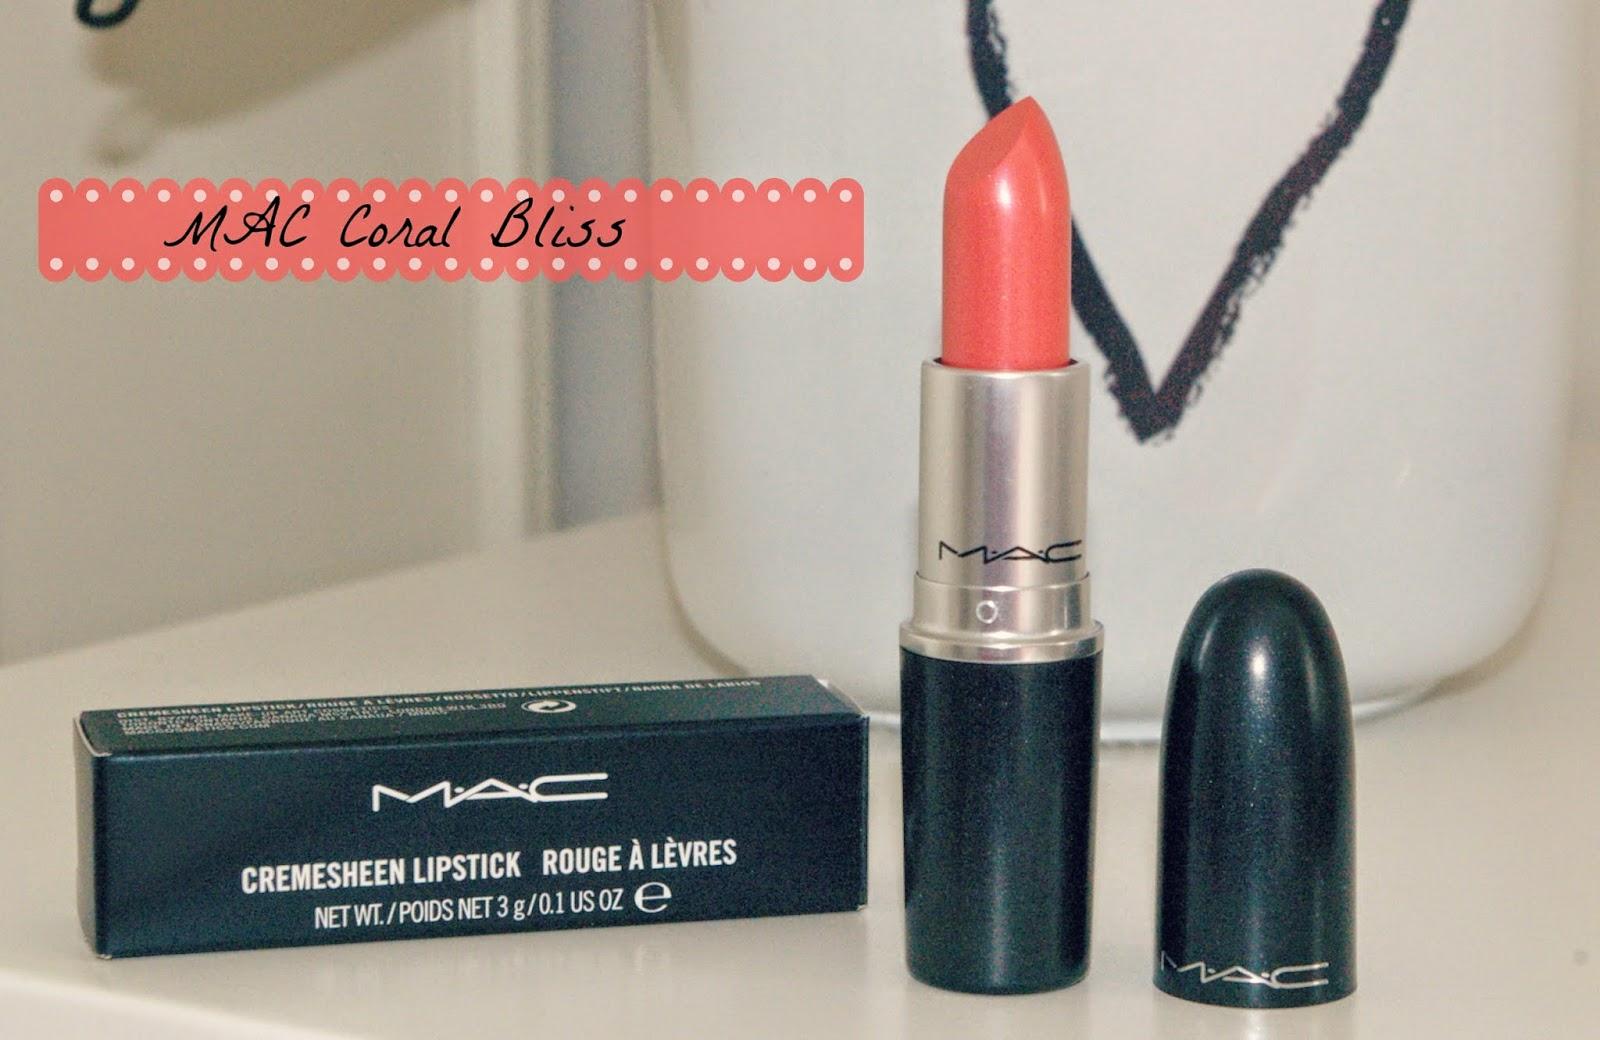 ♥ TiffanysBeautyBox ♥: REVIEW // MAC Coral Bliss Lipstick ♥